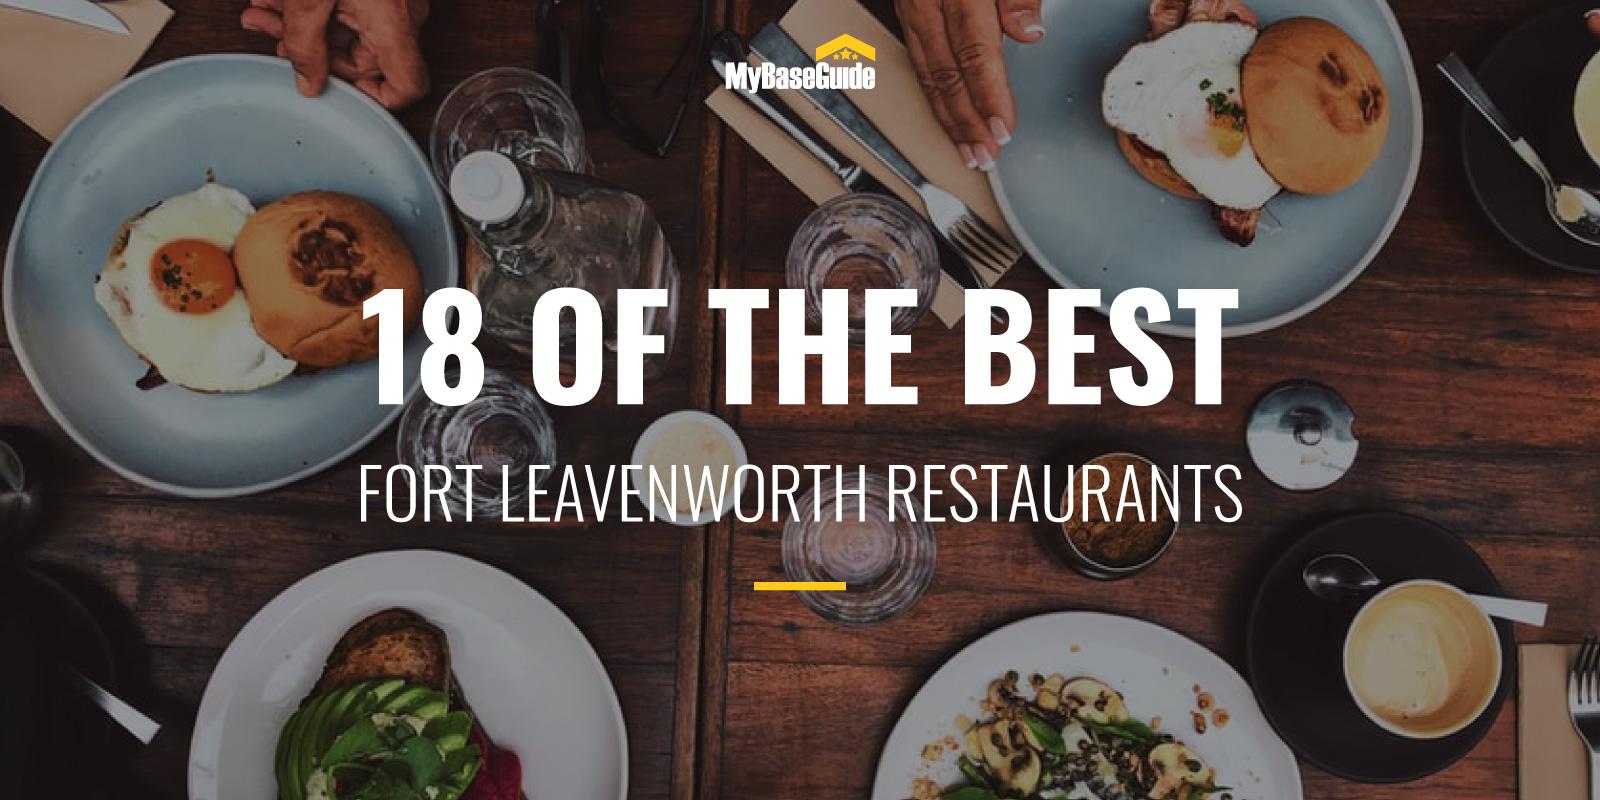 18 of the Best Fort Leavenworth Restaurants